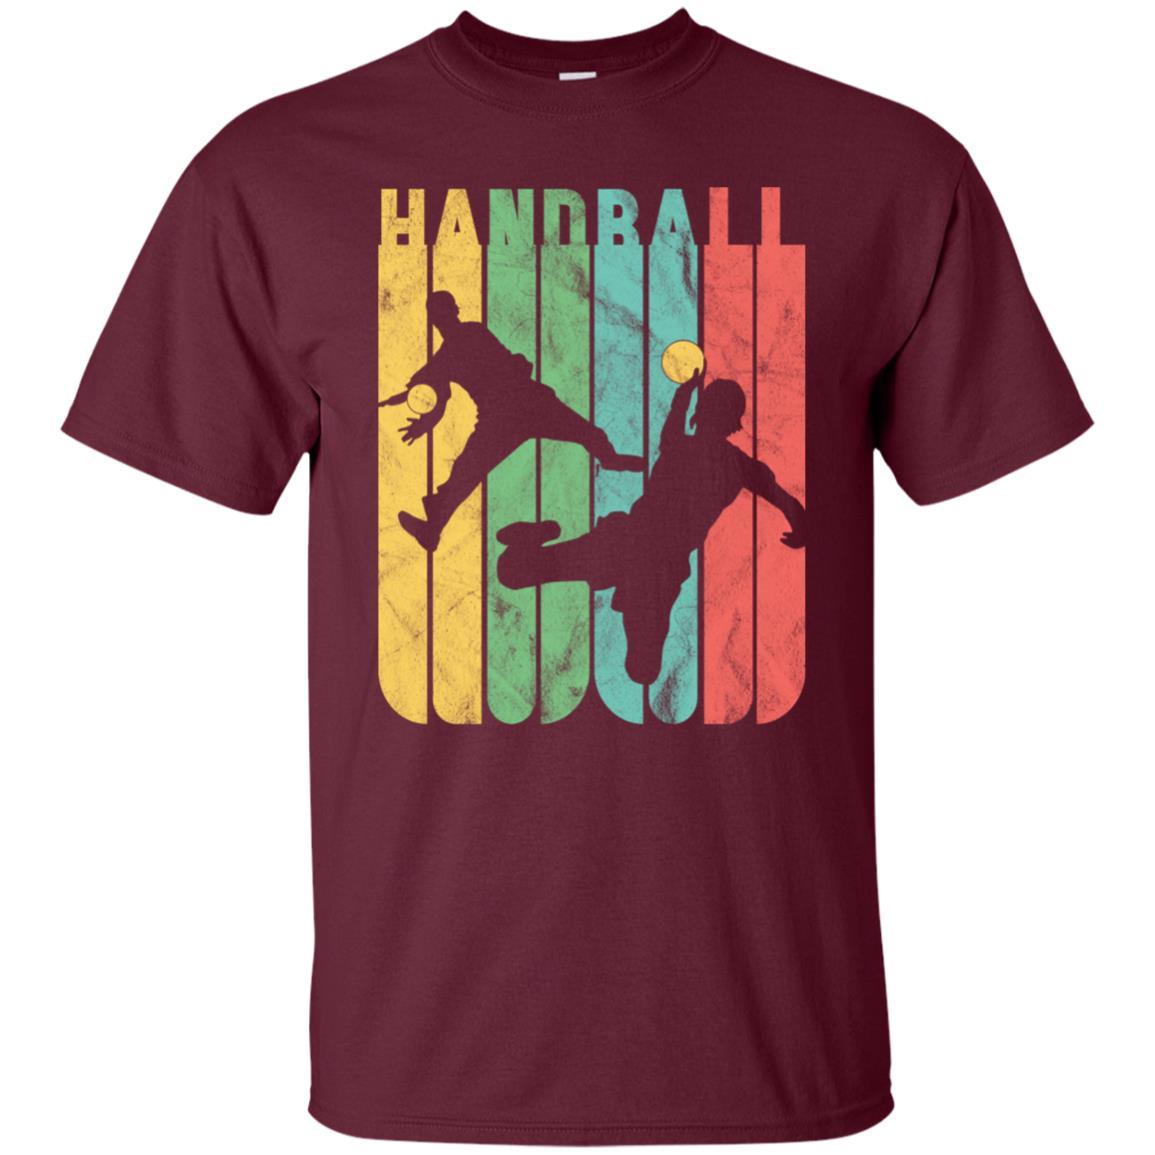 Handball Retro Athlete Gift Unisex Short Sleeve